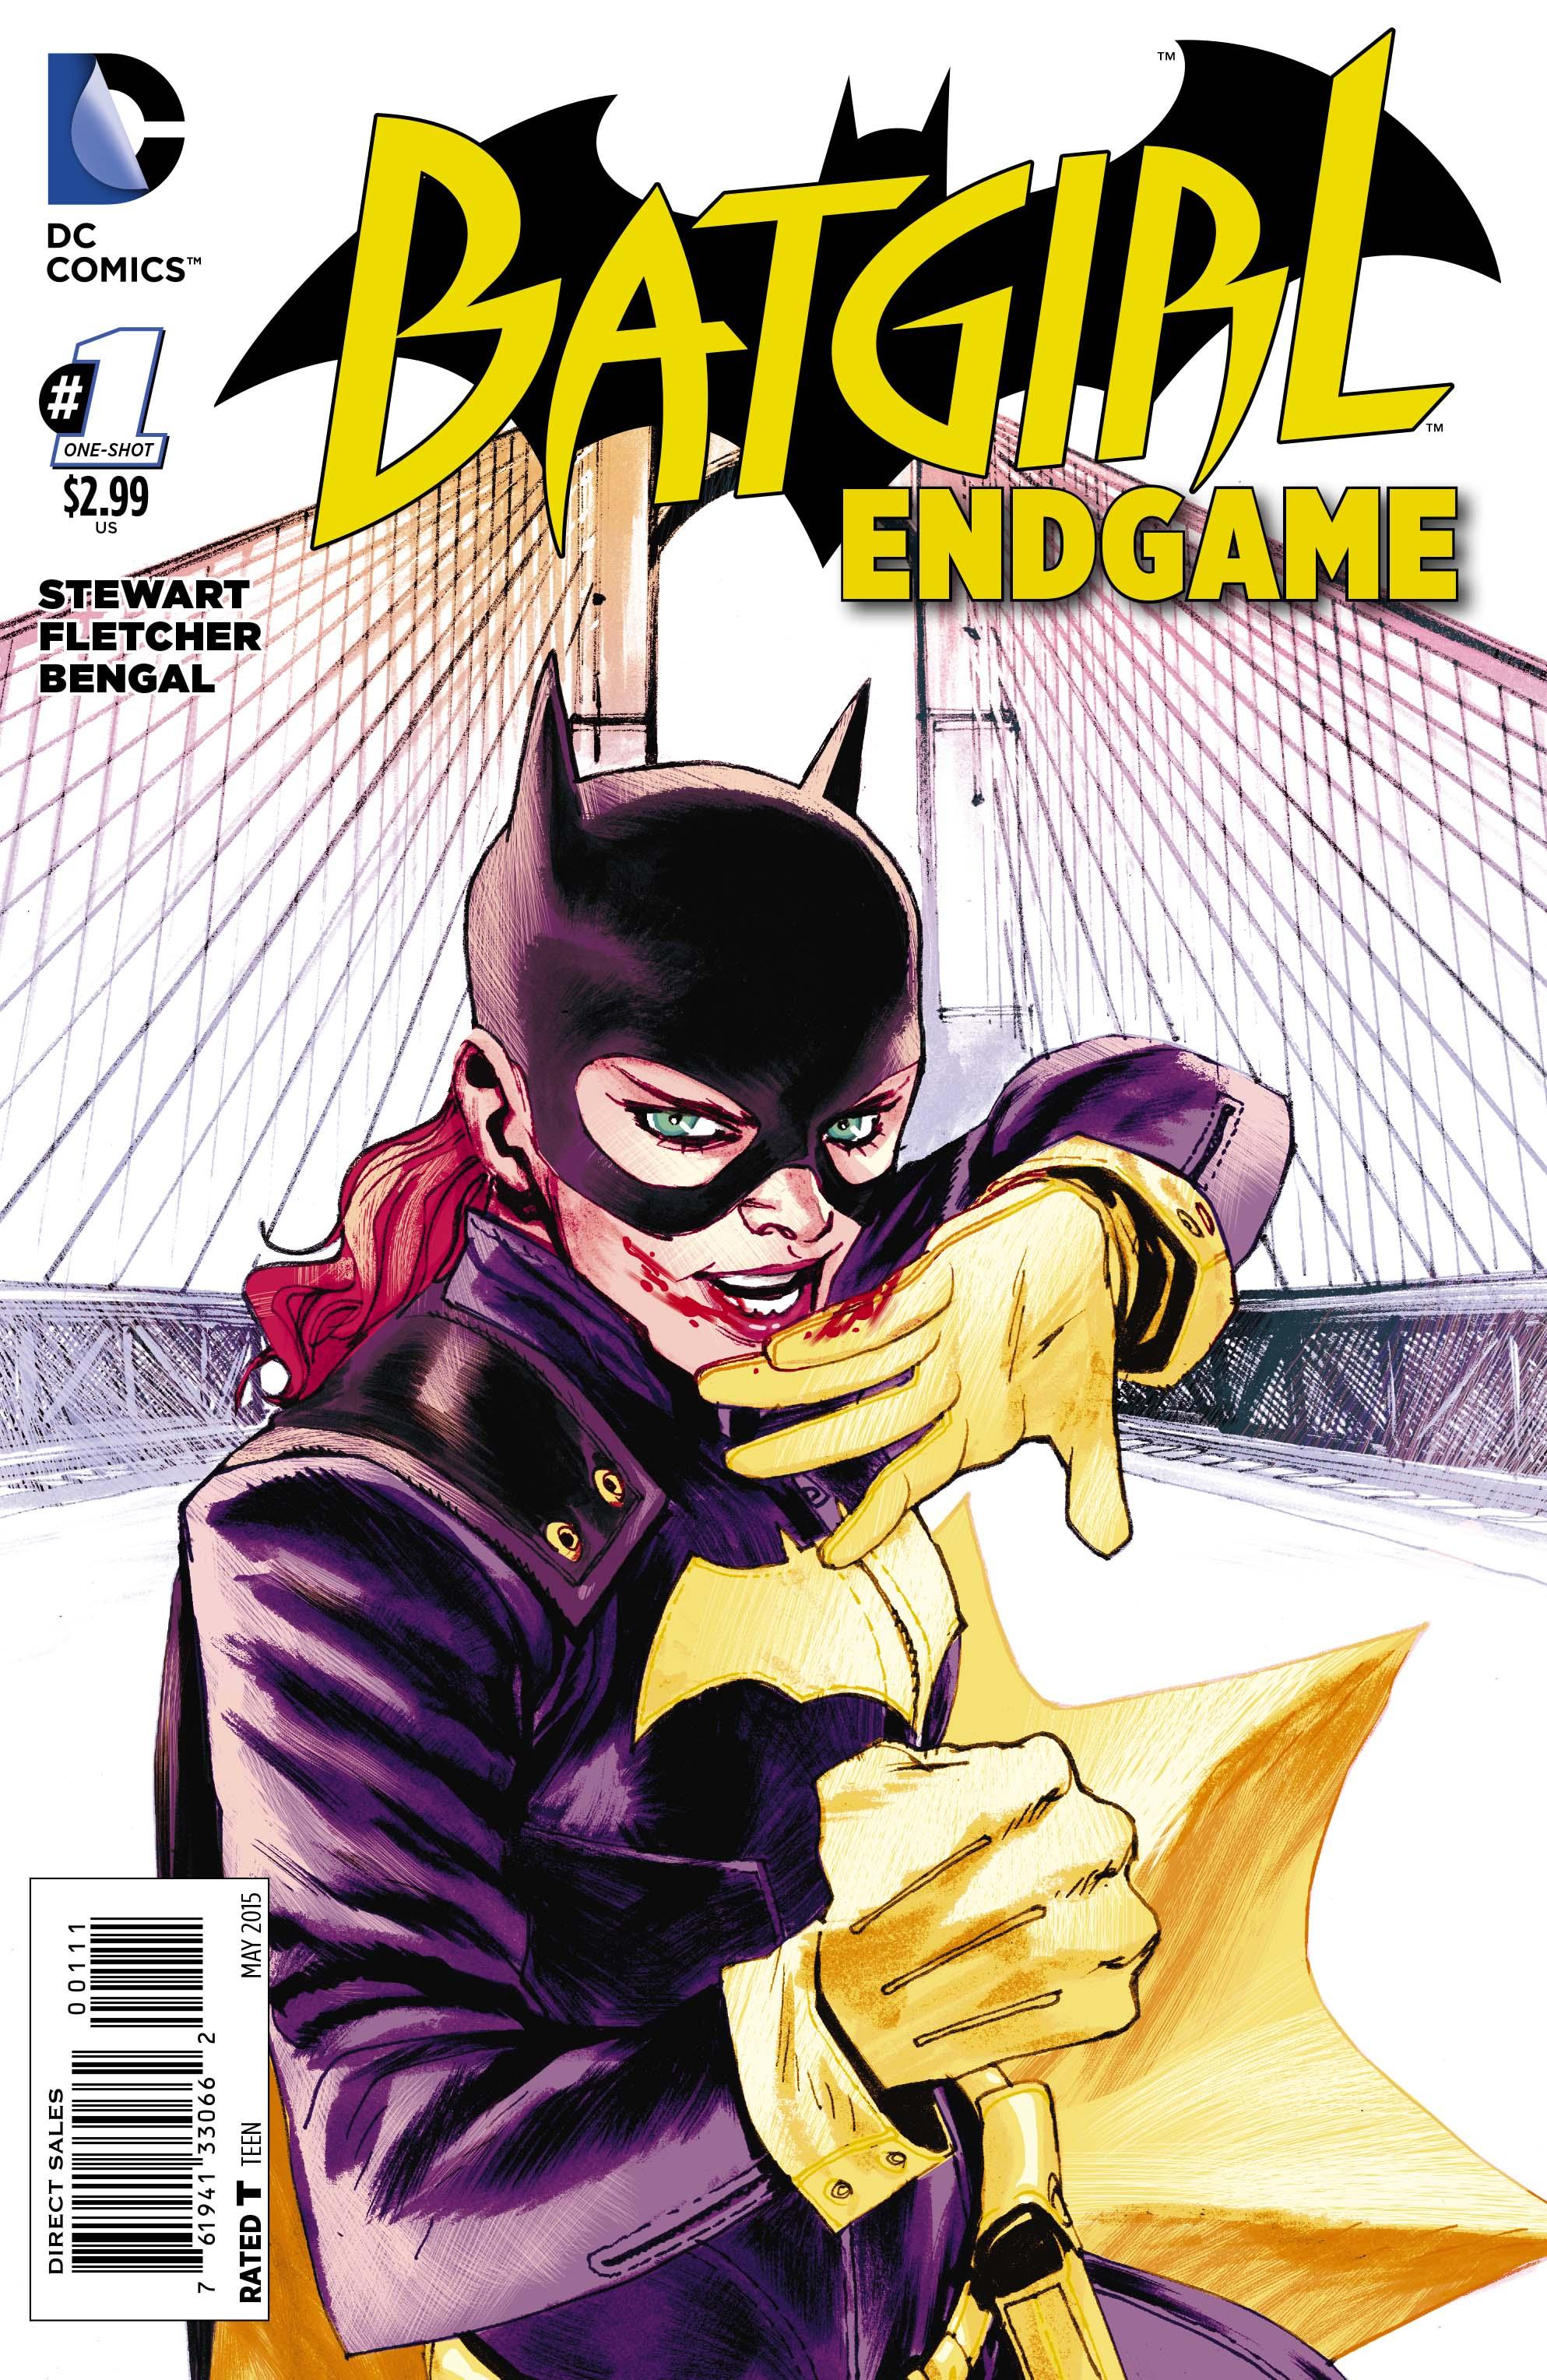 Batgirl Defeated Batgirl endgame cover